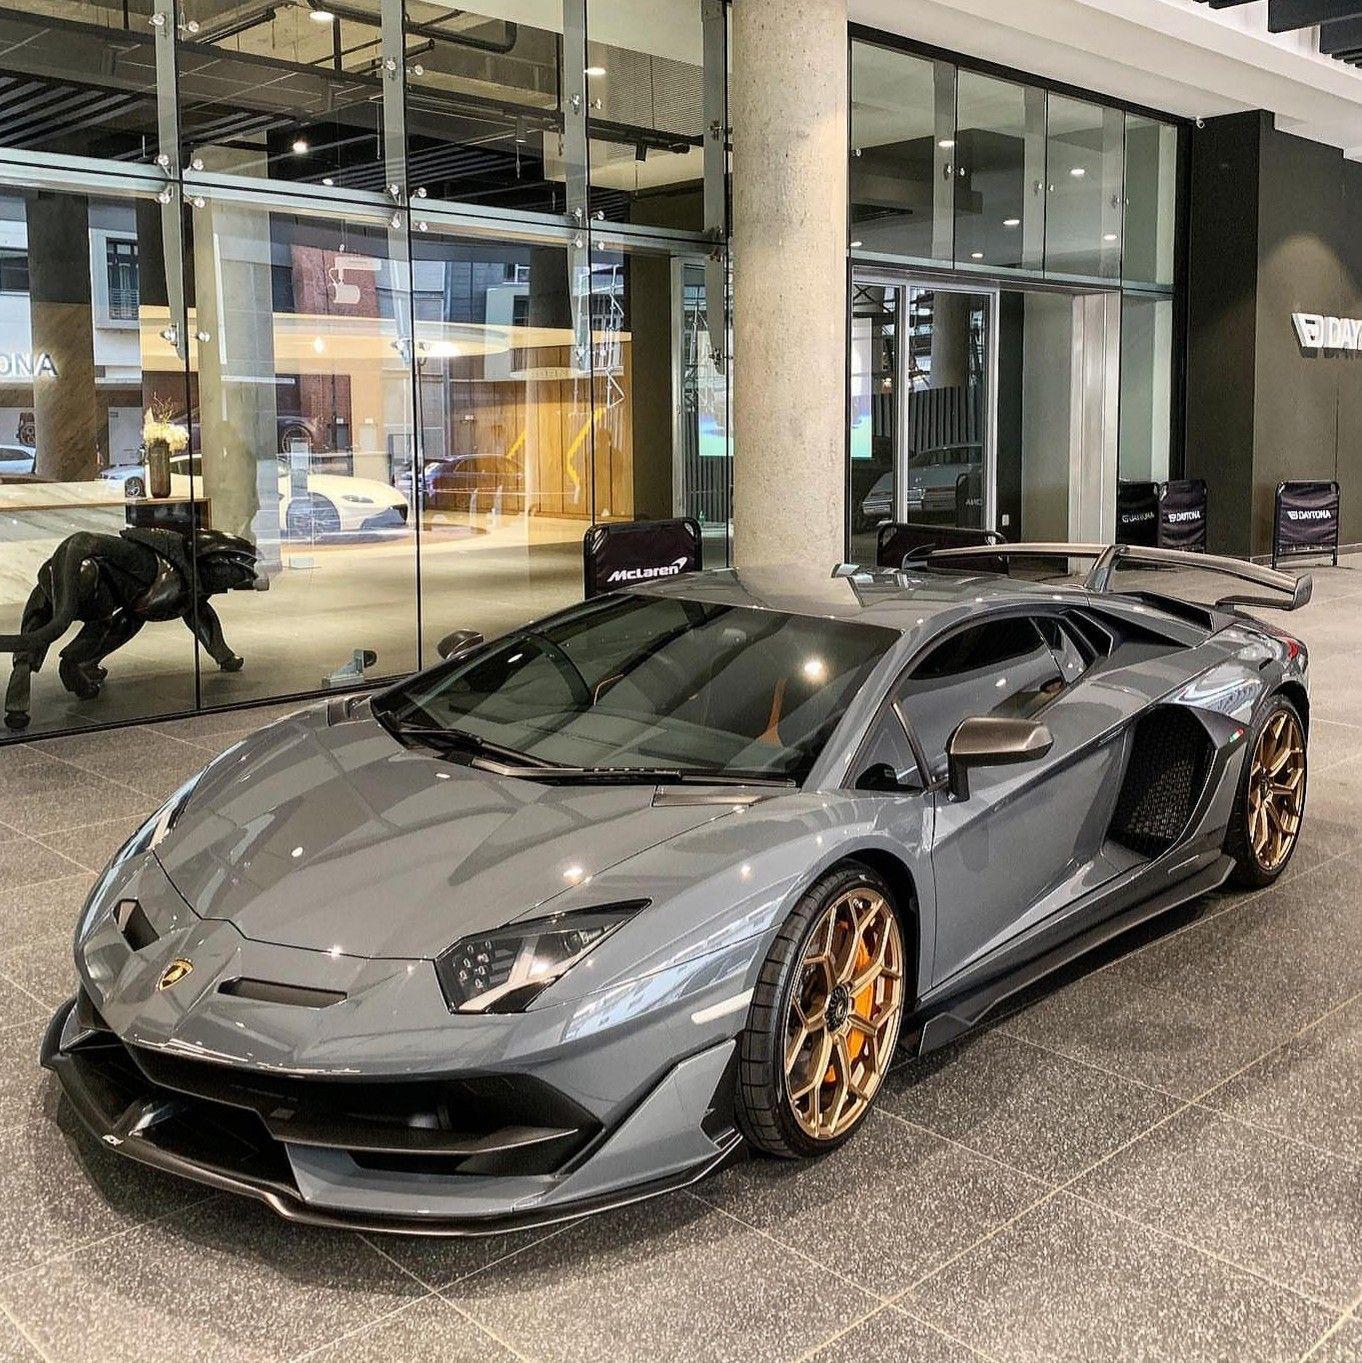 Lambo Lambo Lamborghini Car Luxury Lifestyle Rich Luxury